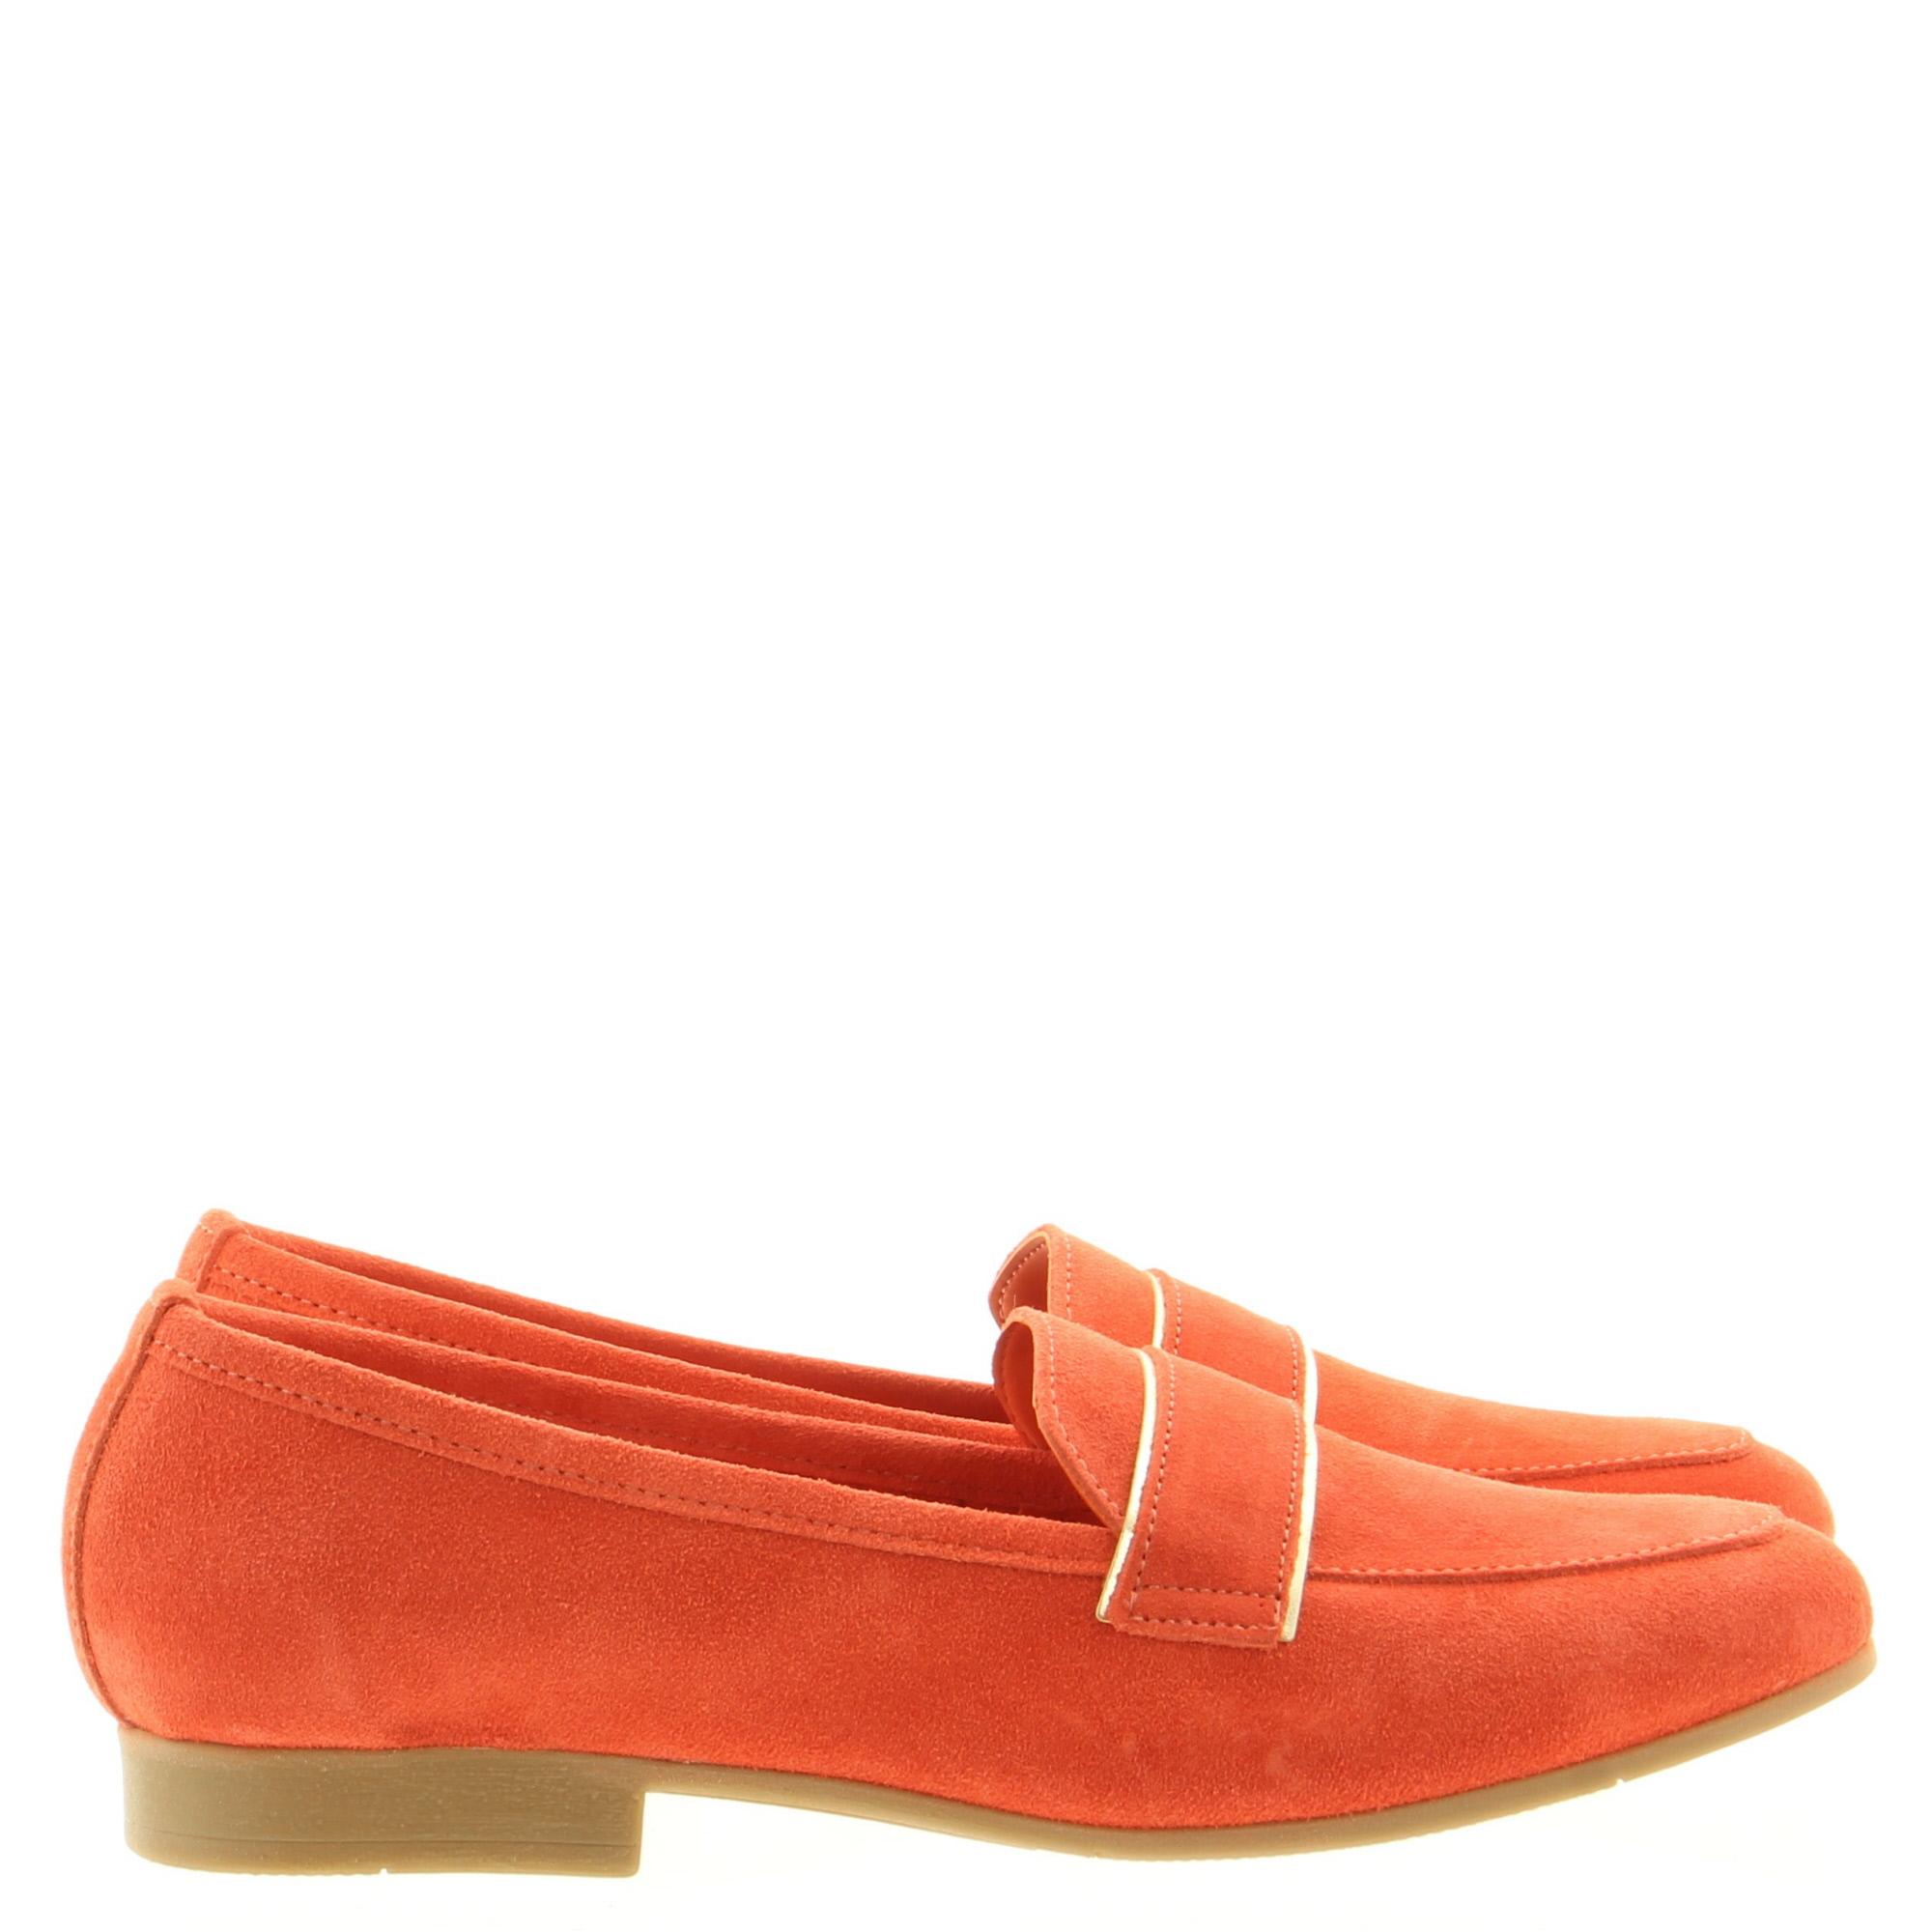 Marco Tozzi 24227 608 Orange